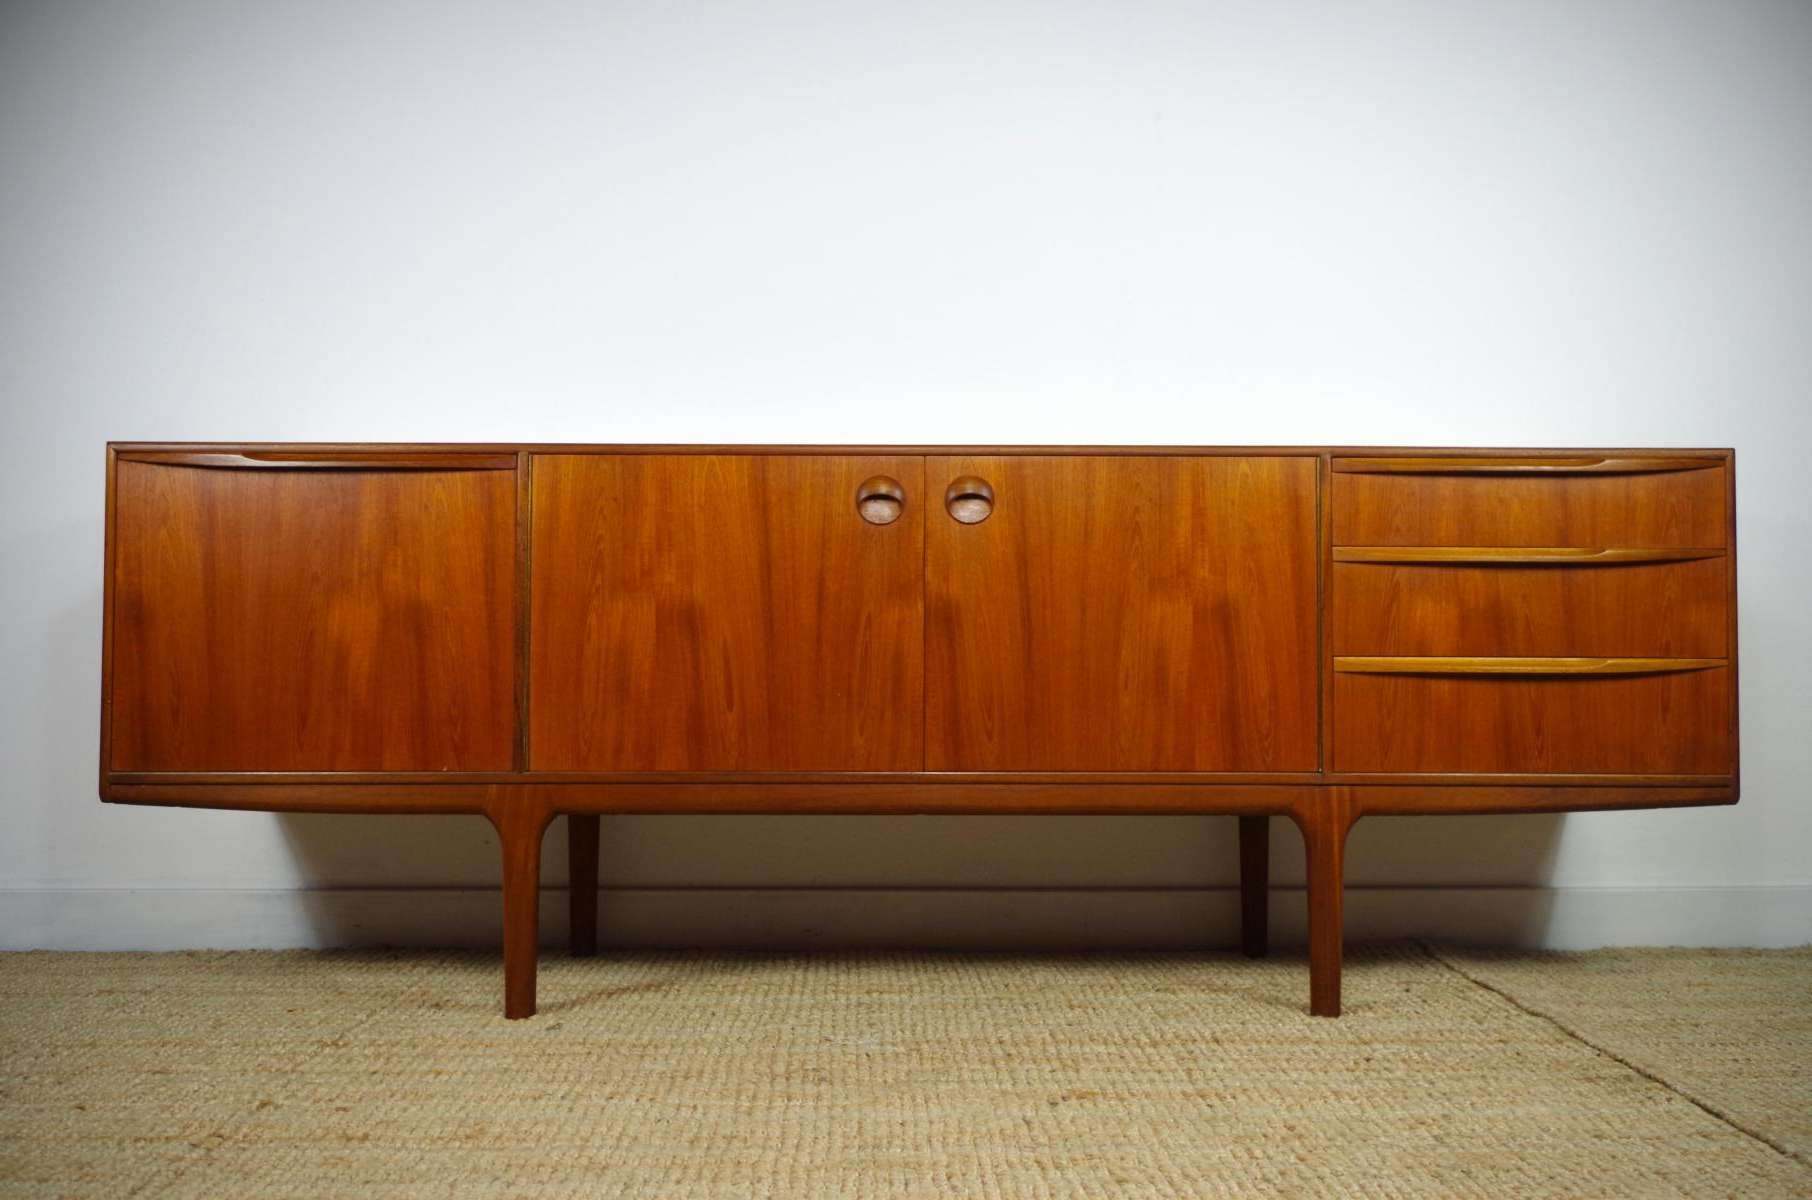 Mid Century Sideboardtom Robertson For Mcintosh For Sale At Pamono With Mid Century Sideboards (View 14 of 20)